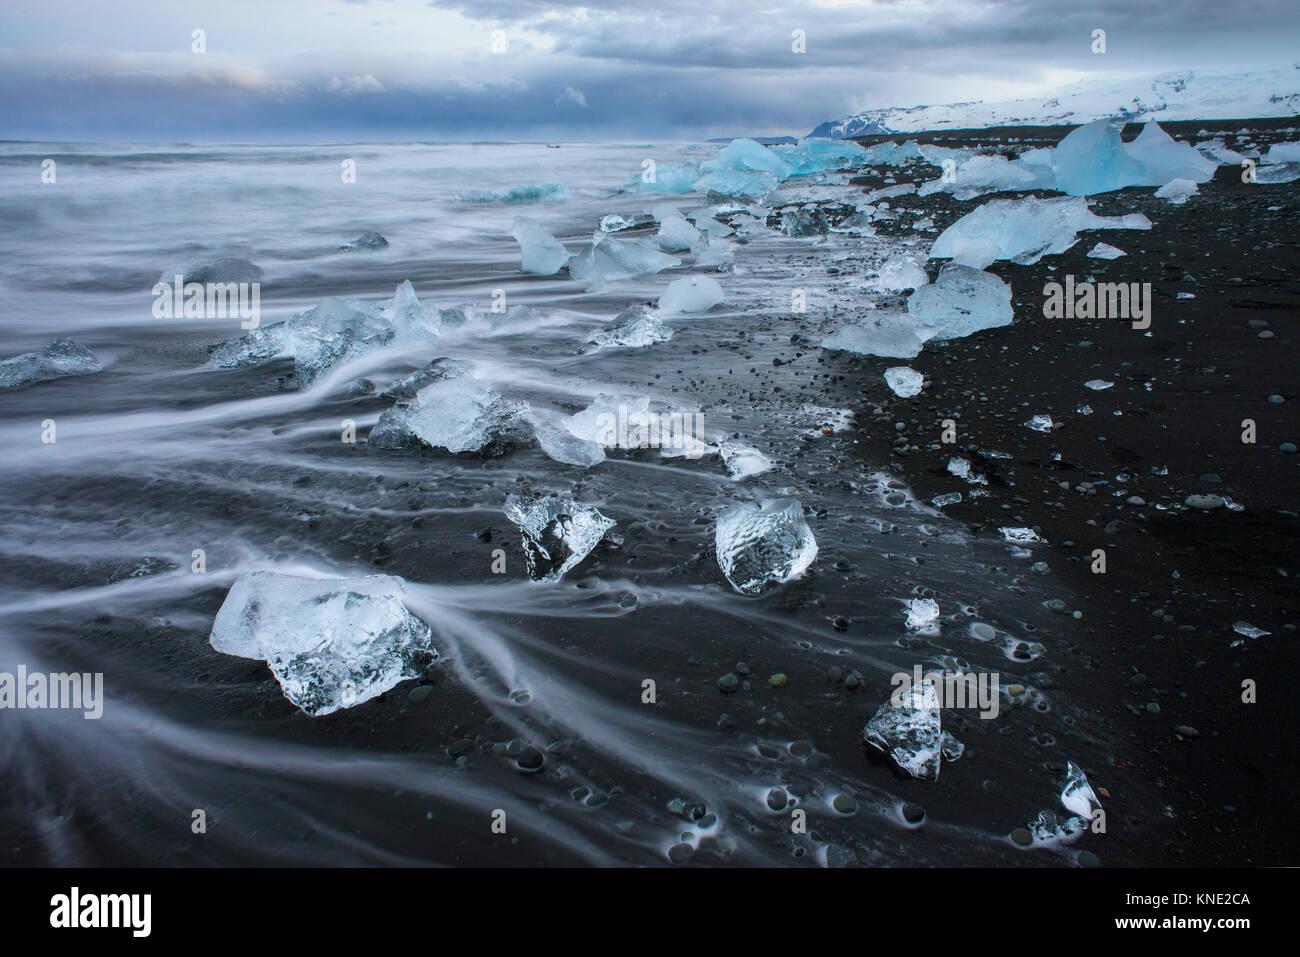 Jokulsarlon beach in Iceland - Stock Image